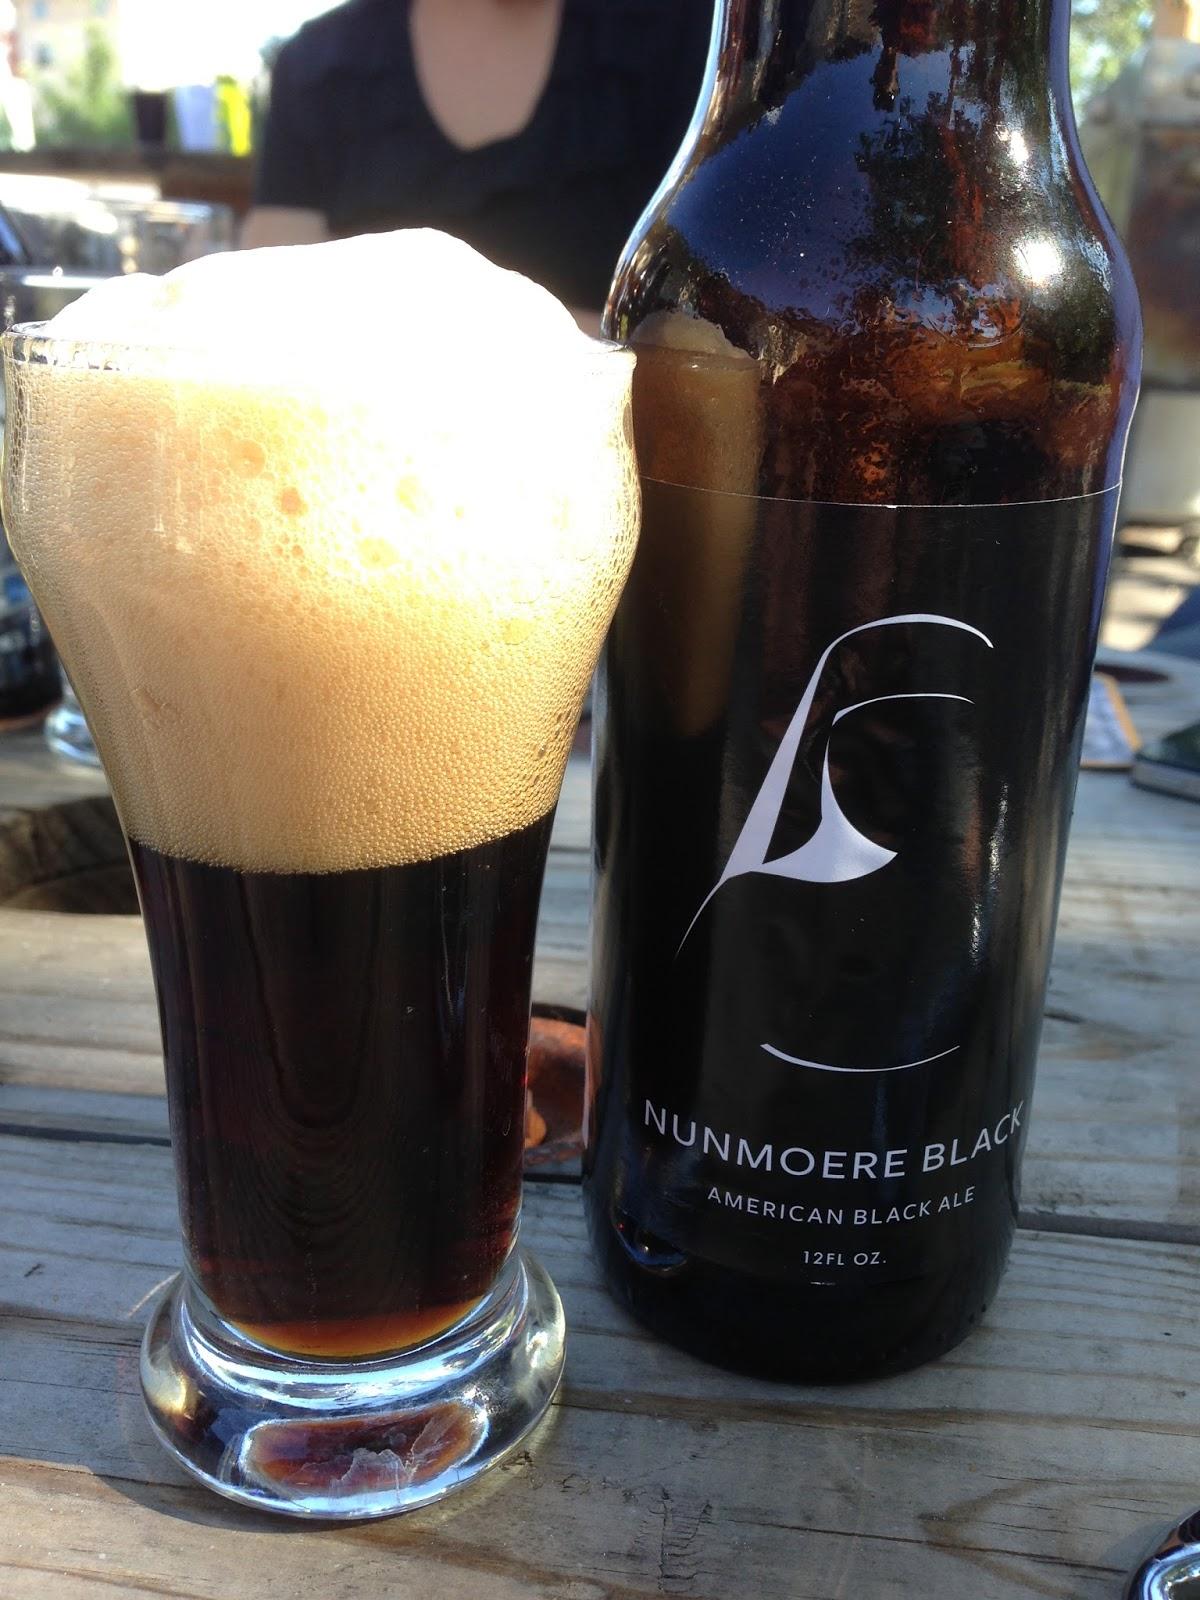 indiana beer barons: black ipa taste off!